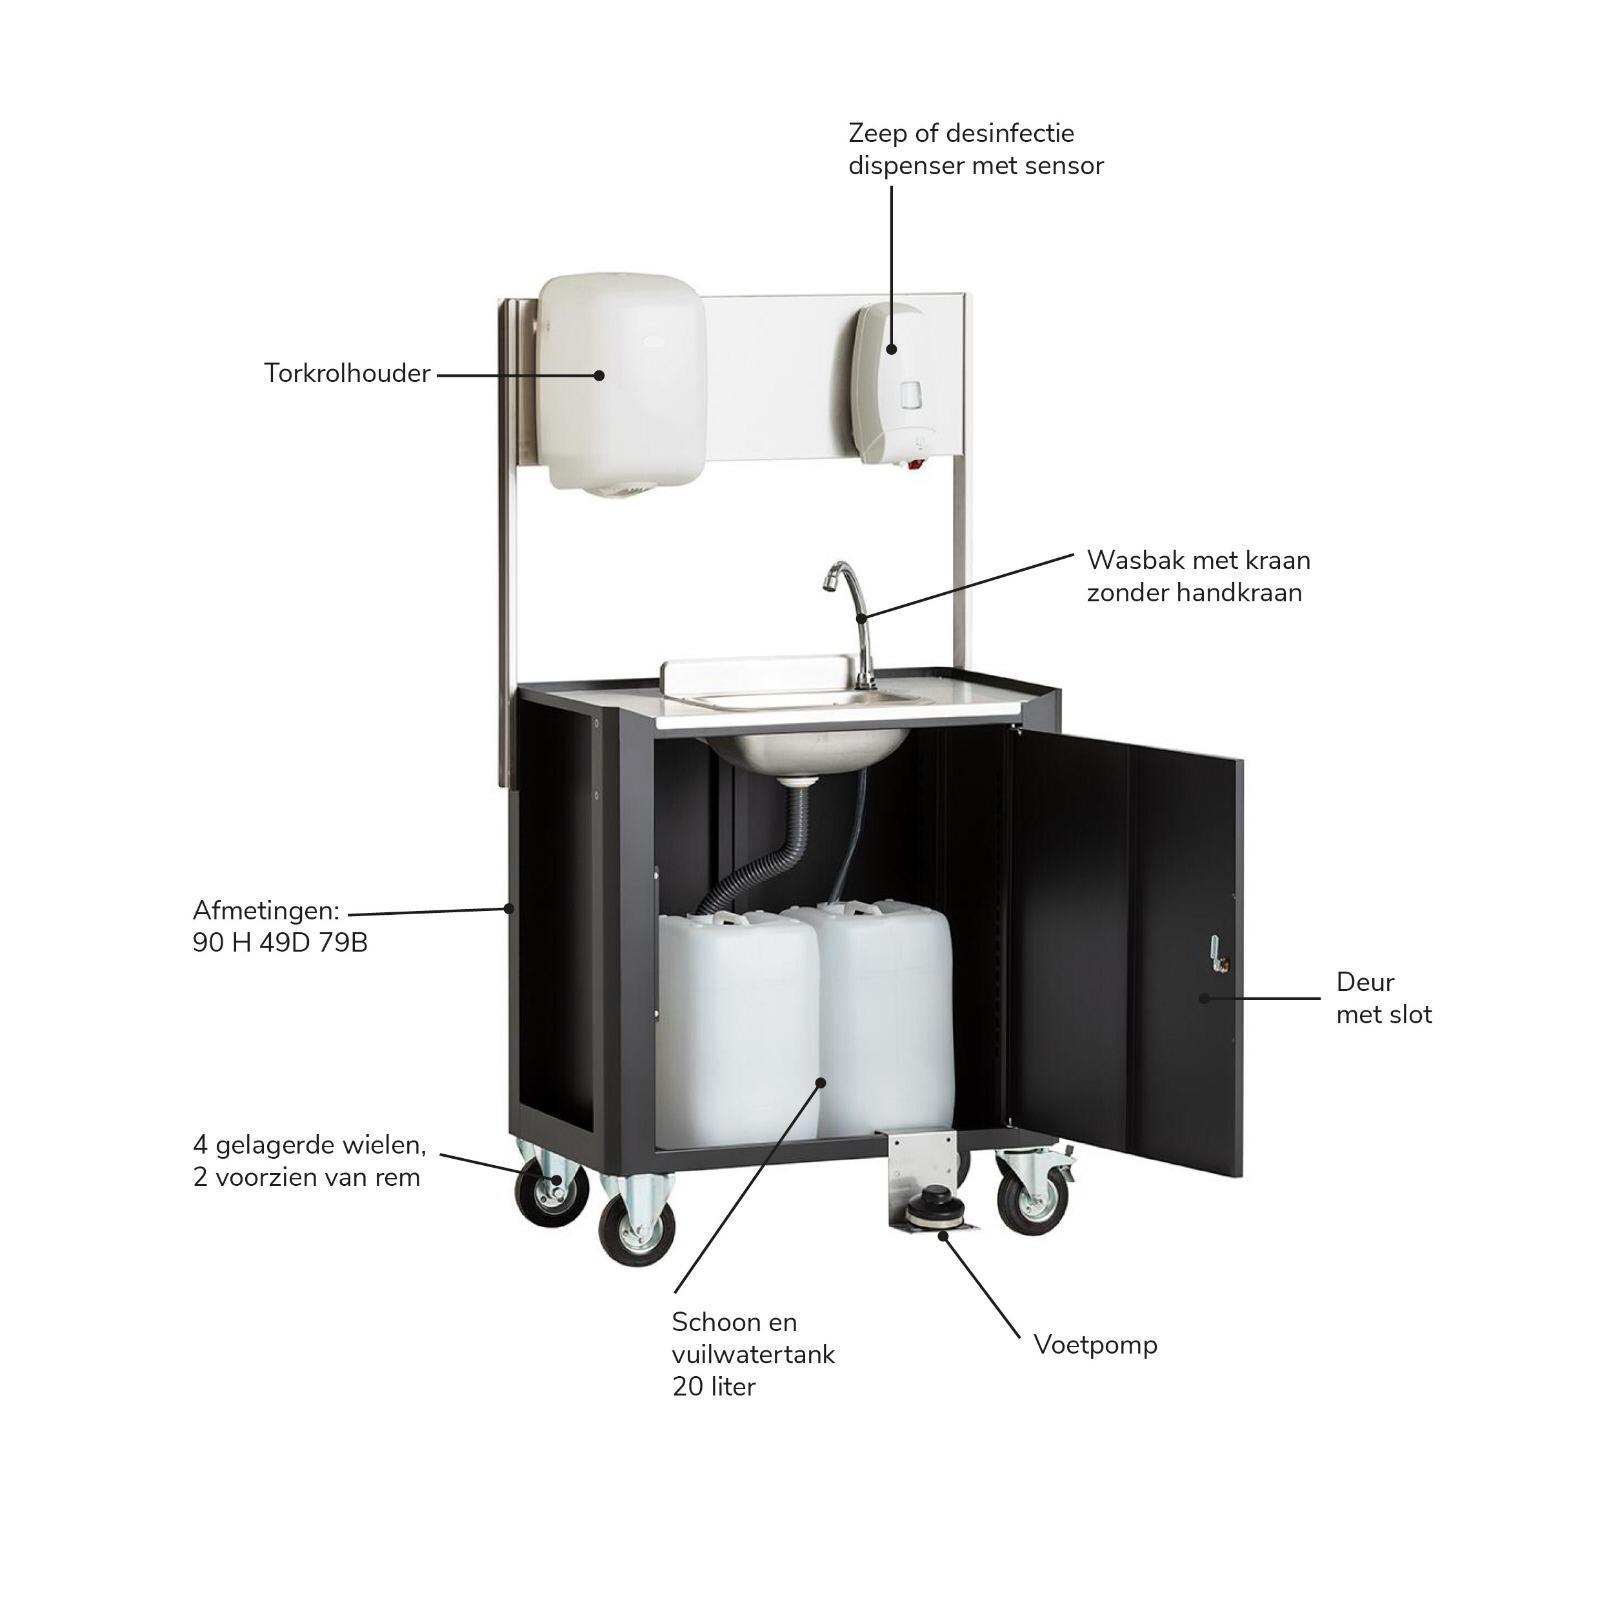 Mobile washing unit foto 4